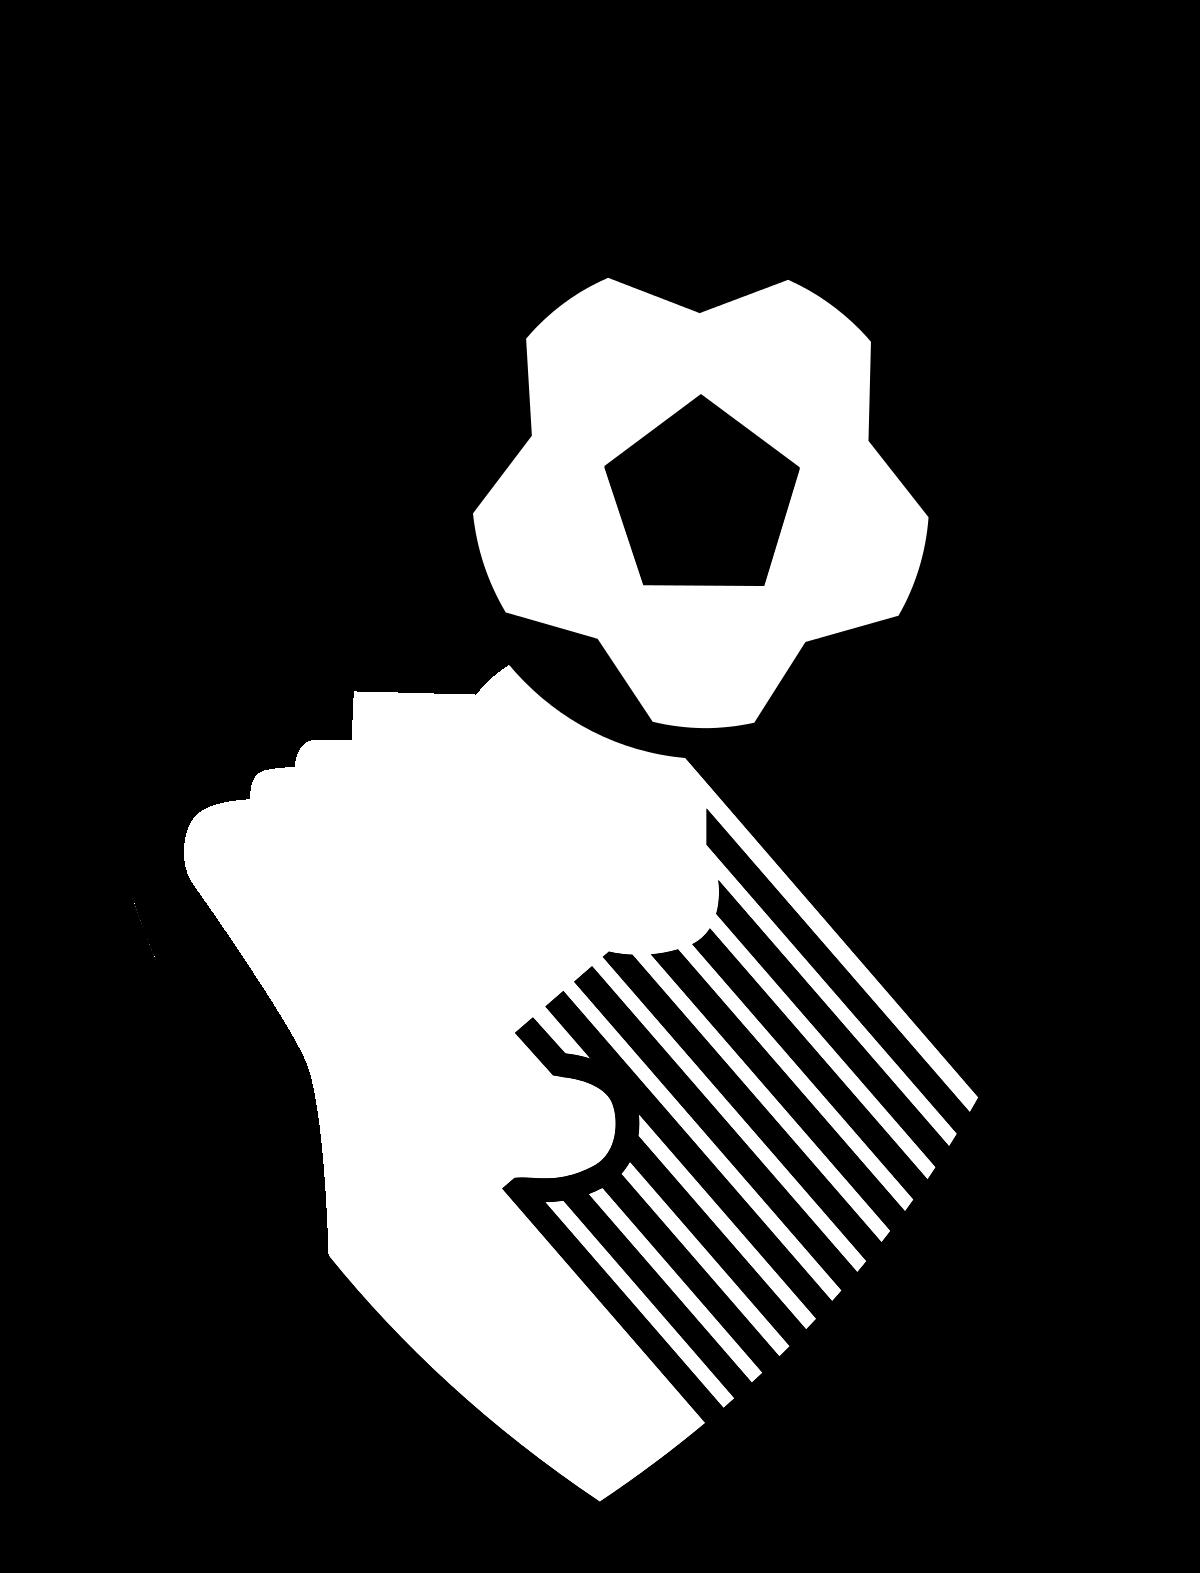 Logo Bournemouth Fc PNG-PlusPNG.com-1200 - Logo Bournemouth Fc PNG